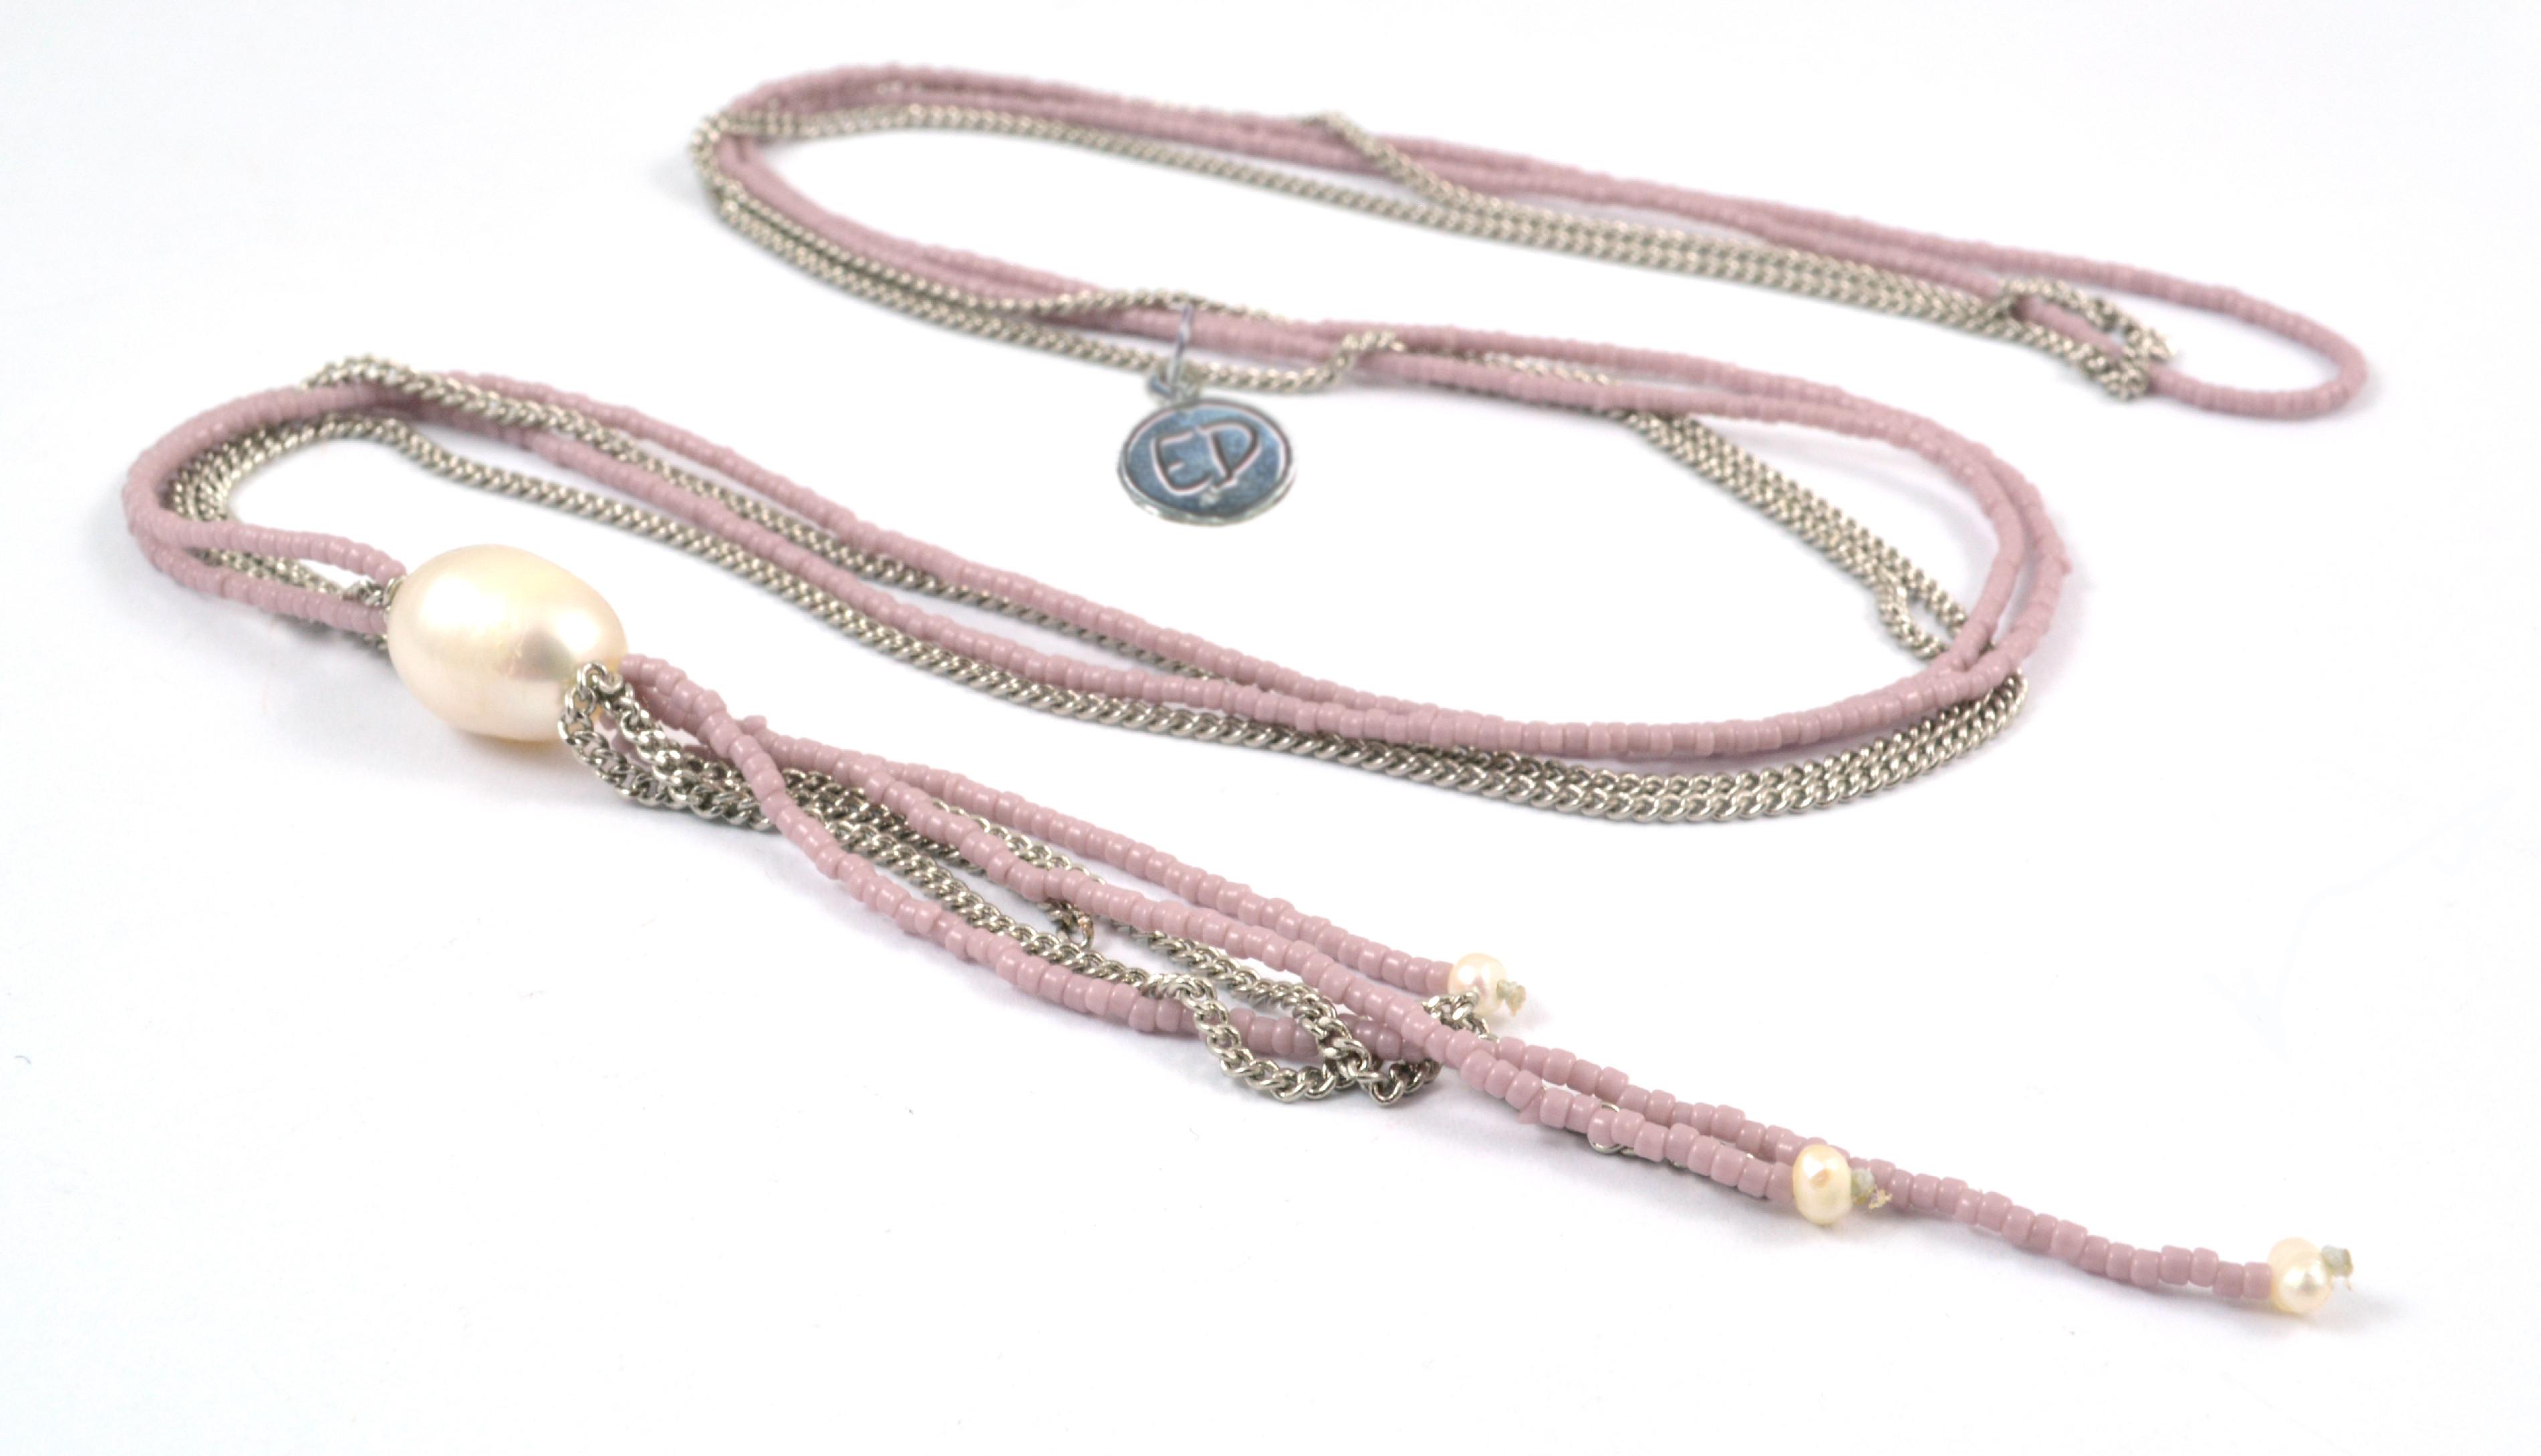 Dámsky prírodný náhrdelník z japonského rokajlu a riečnych perál - ružový